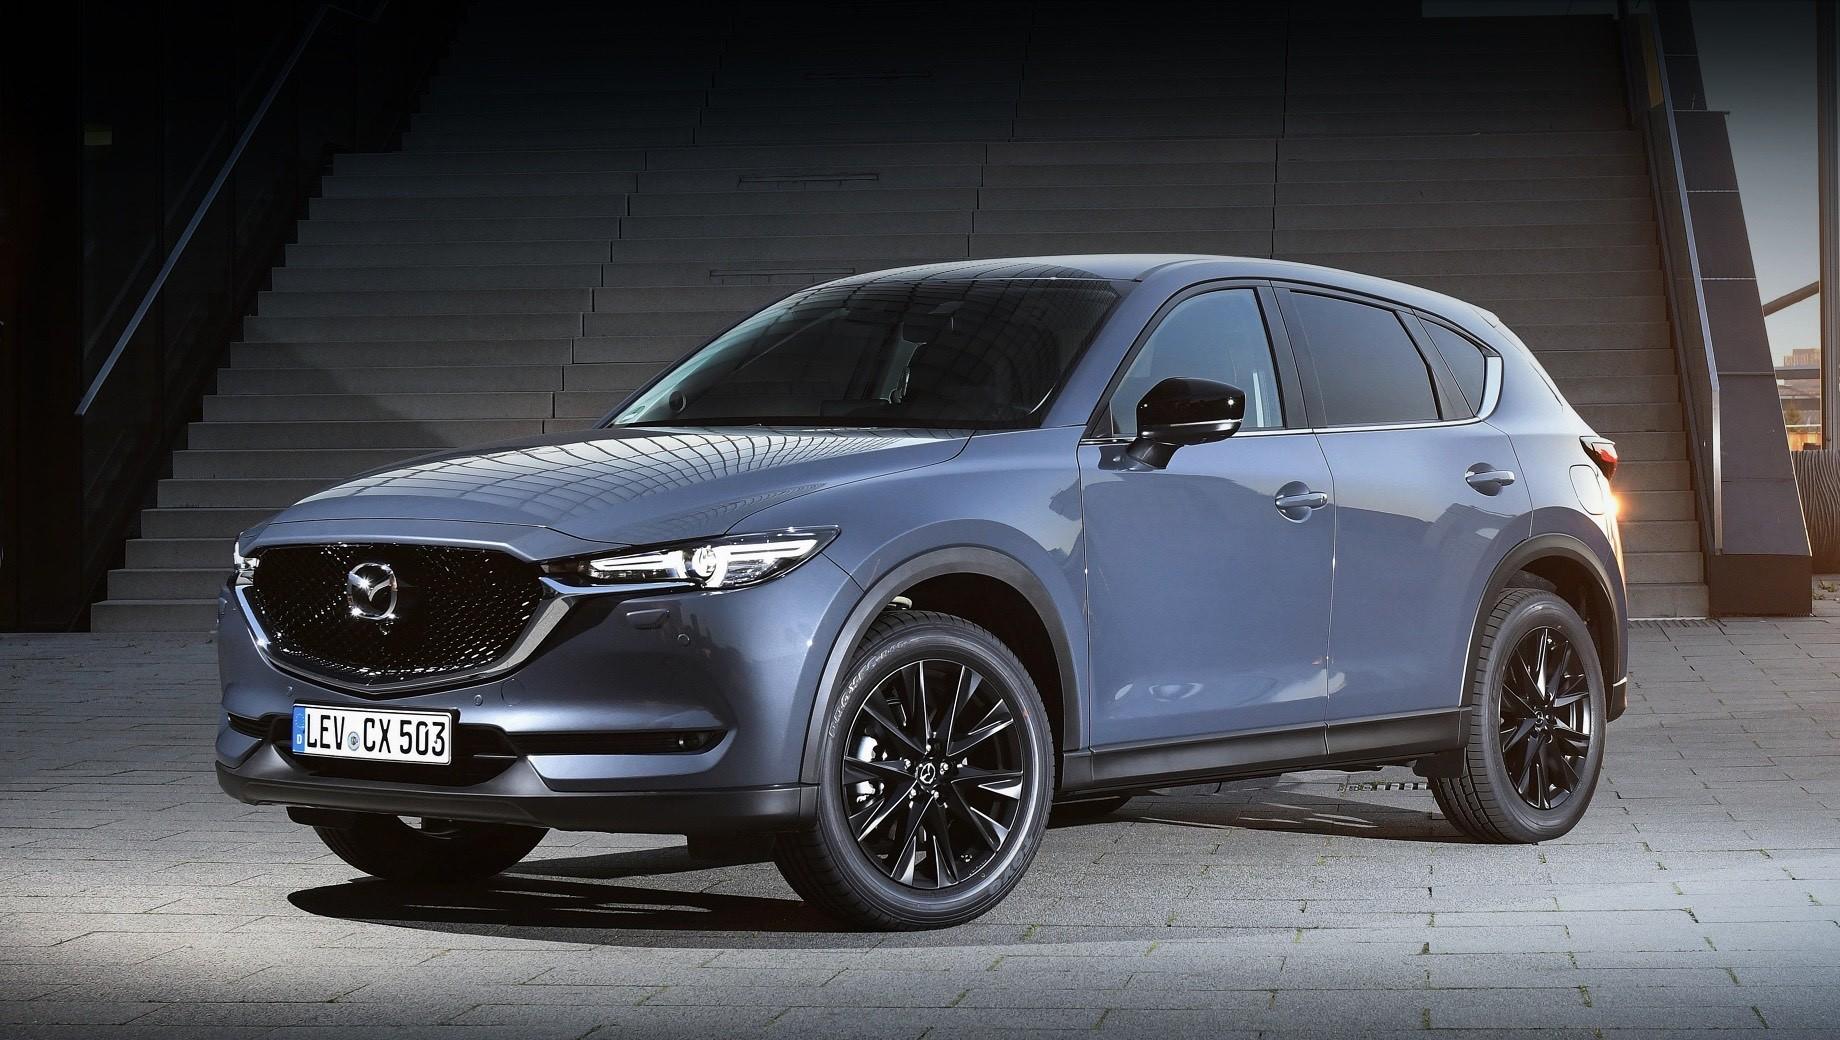 Следующая Mazda CX-5 сохранит прежнее имя и станет крупнее